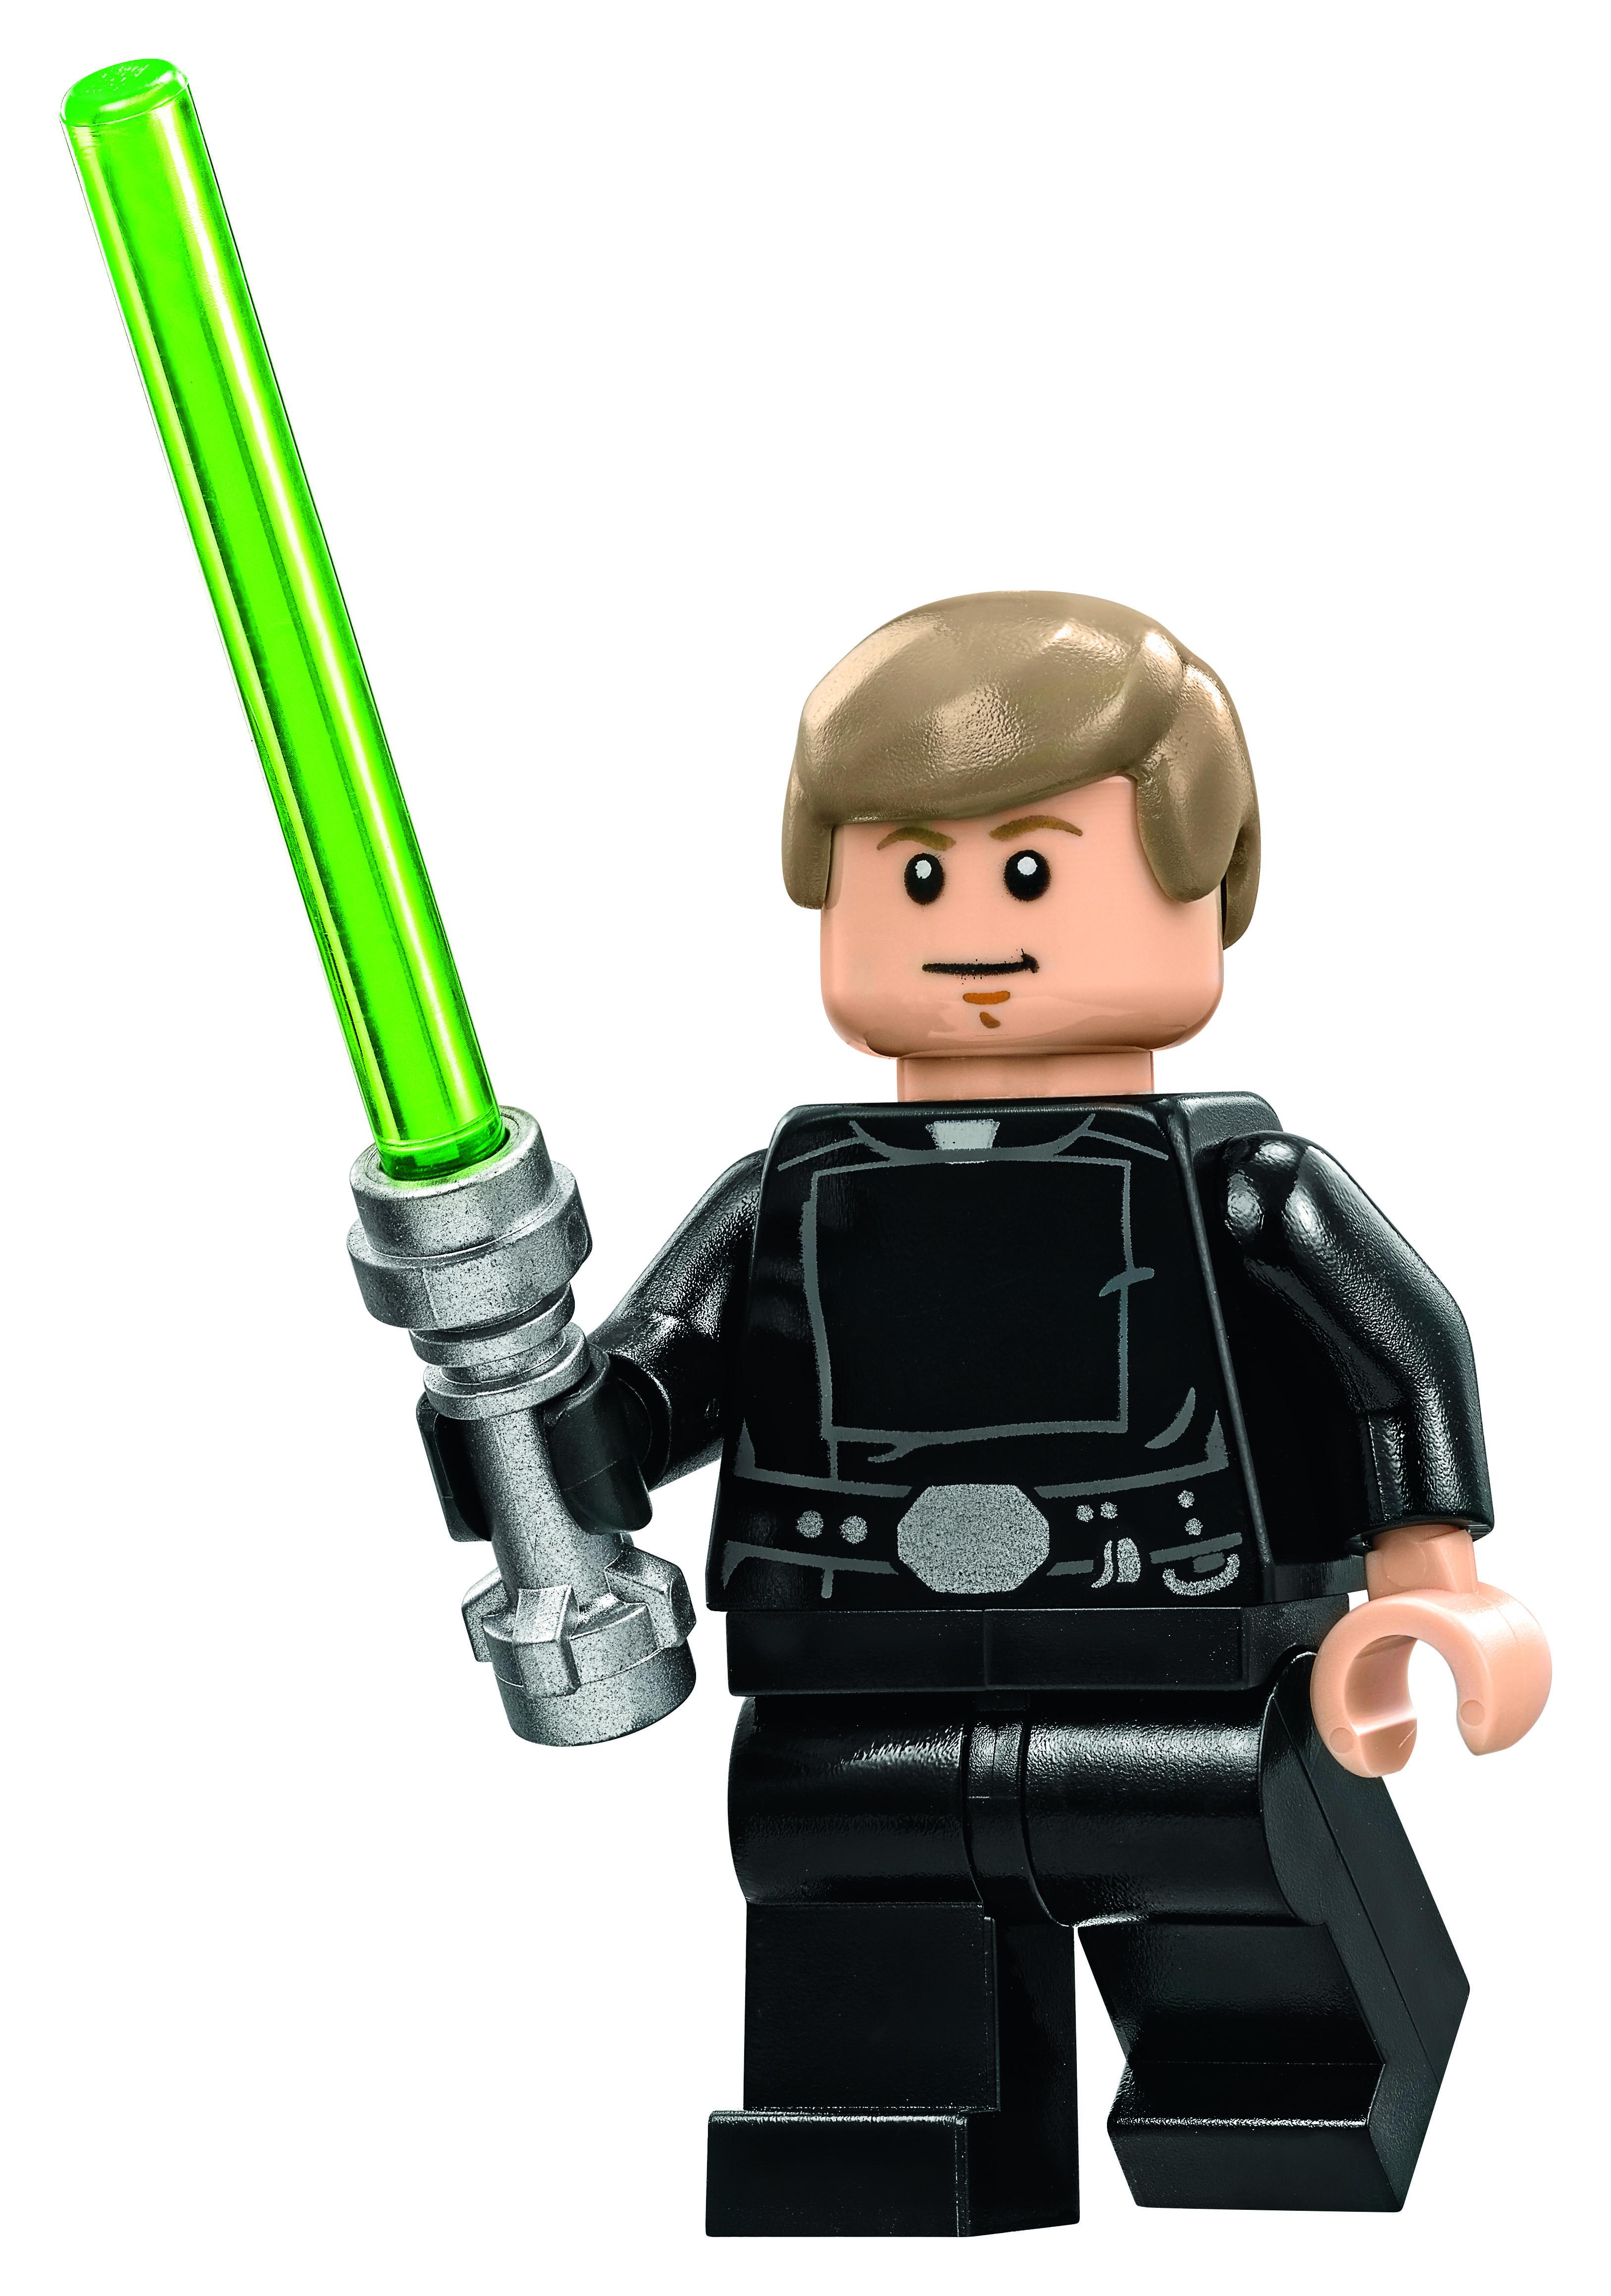 Lego Star Wars Ucs Death Star 75159 24 The Brick Fan